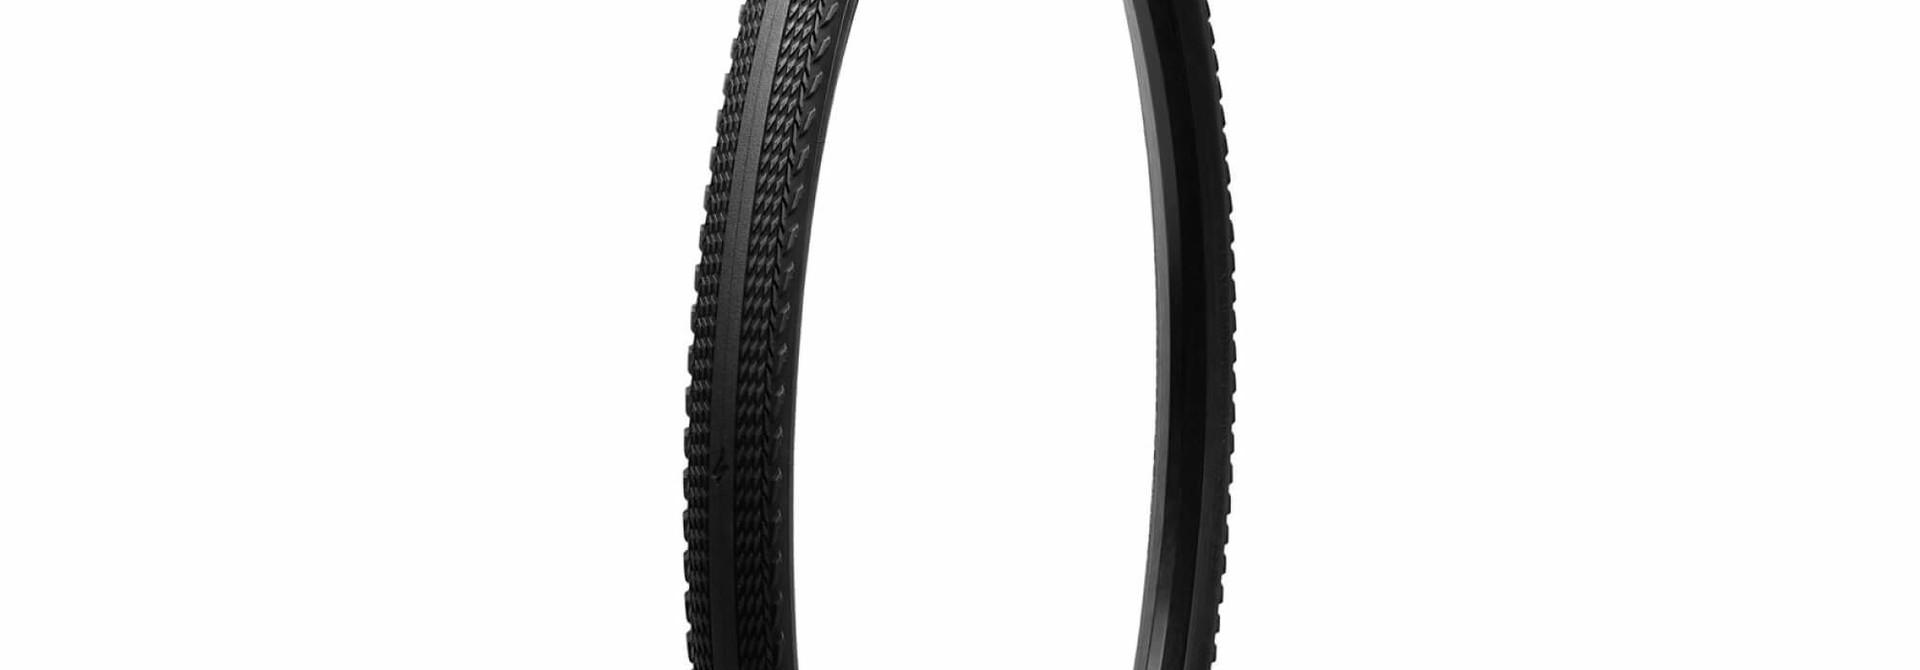 Pathfinder Pro 2BR Tire